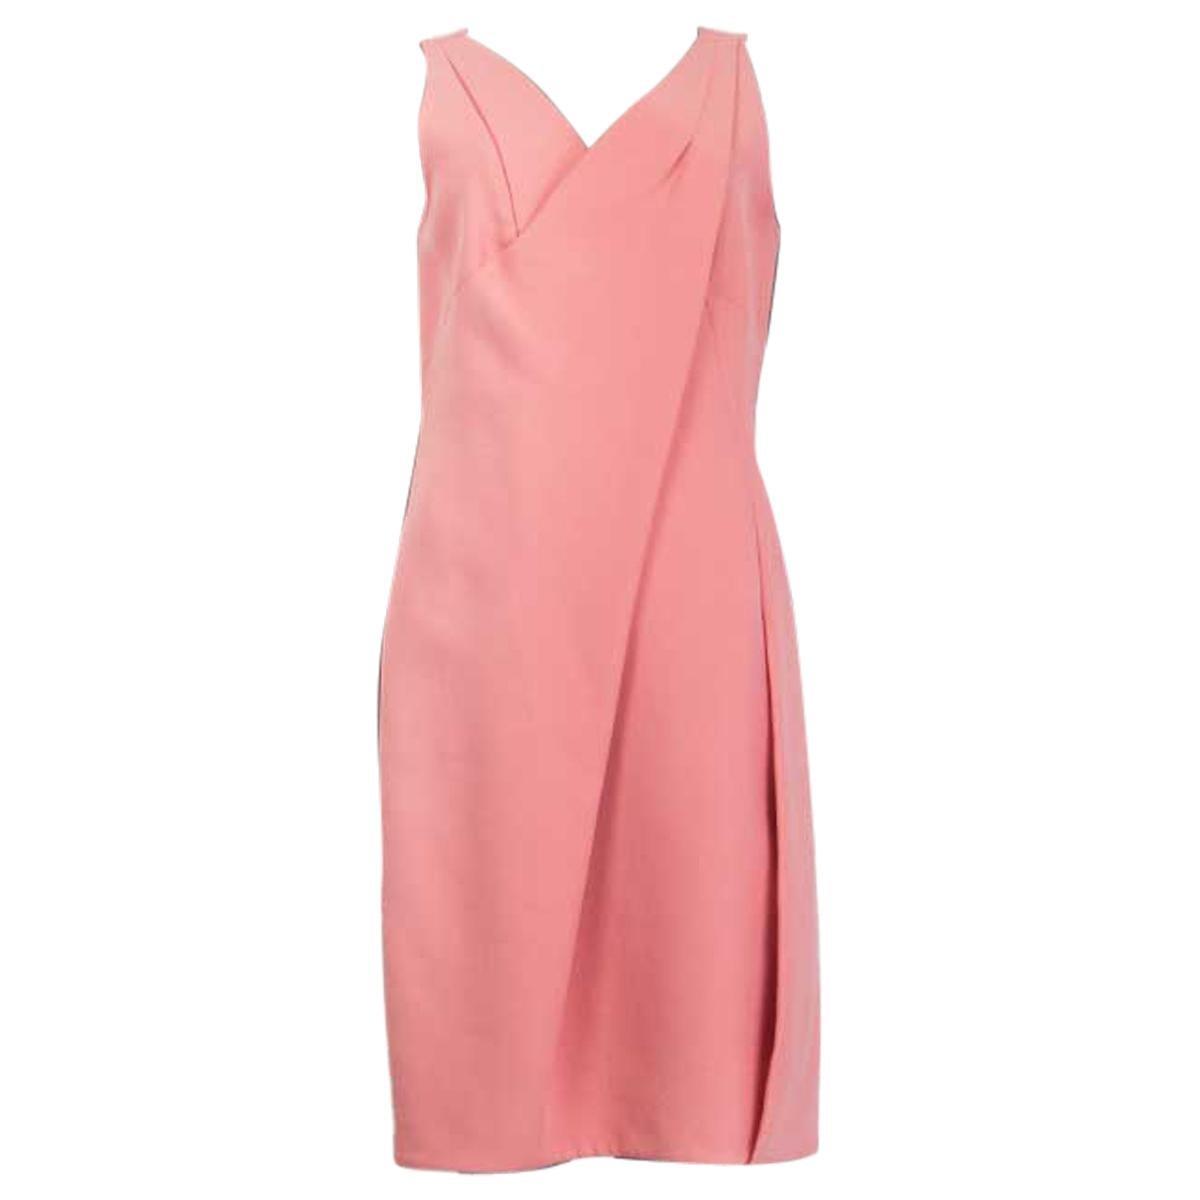 PRADA baby pink cotton DRAPED Sleeveless Shift Dress 44 L